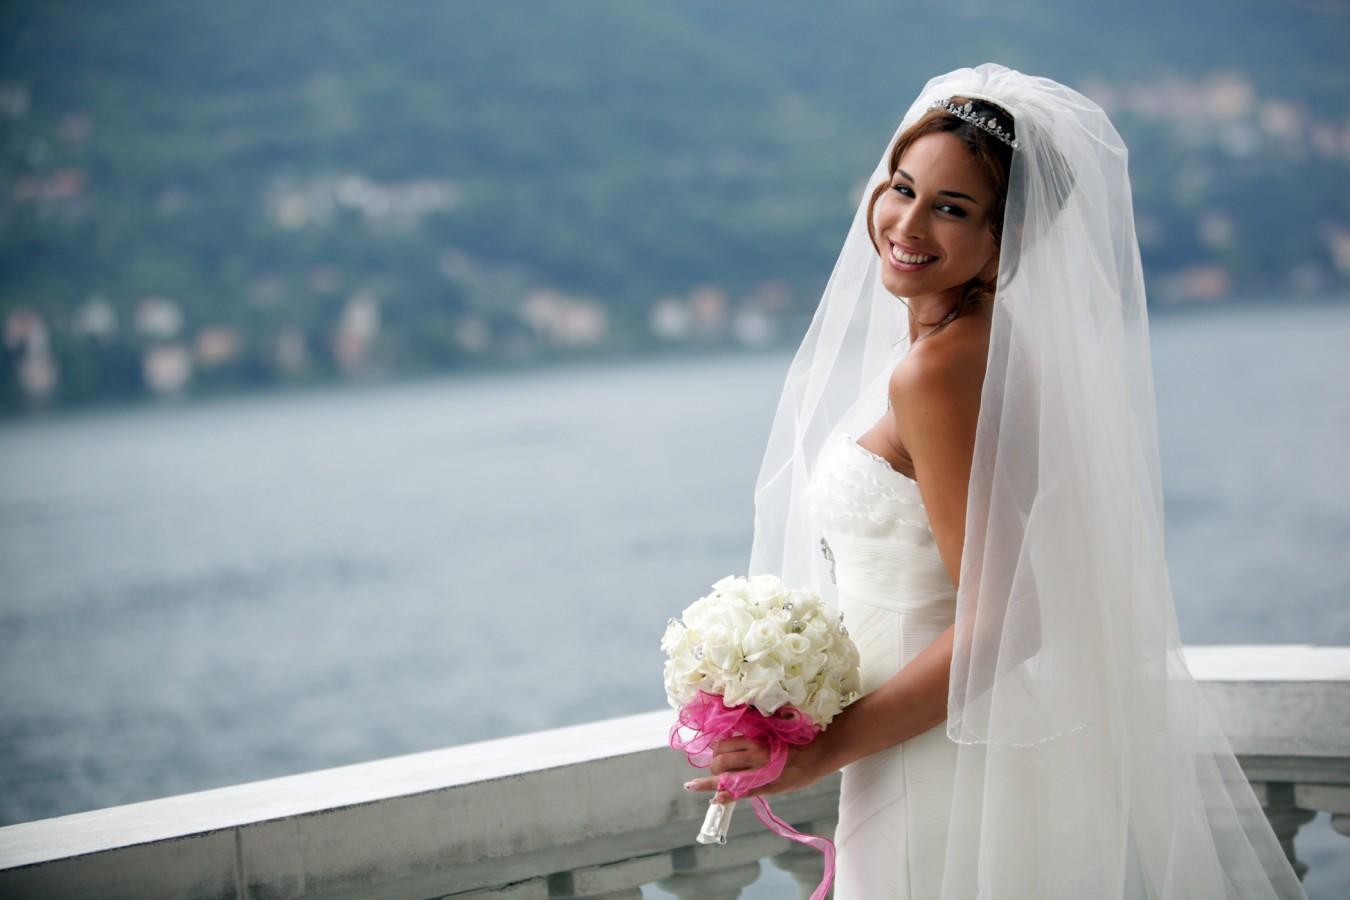 lake_wedding_in_italy_14-1350×900